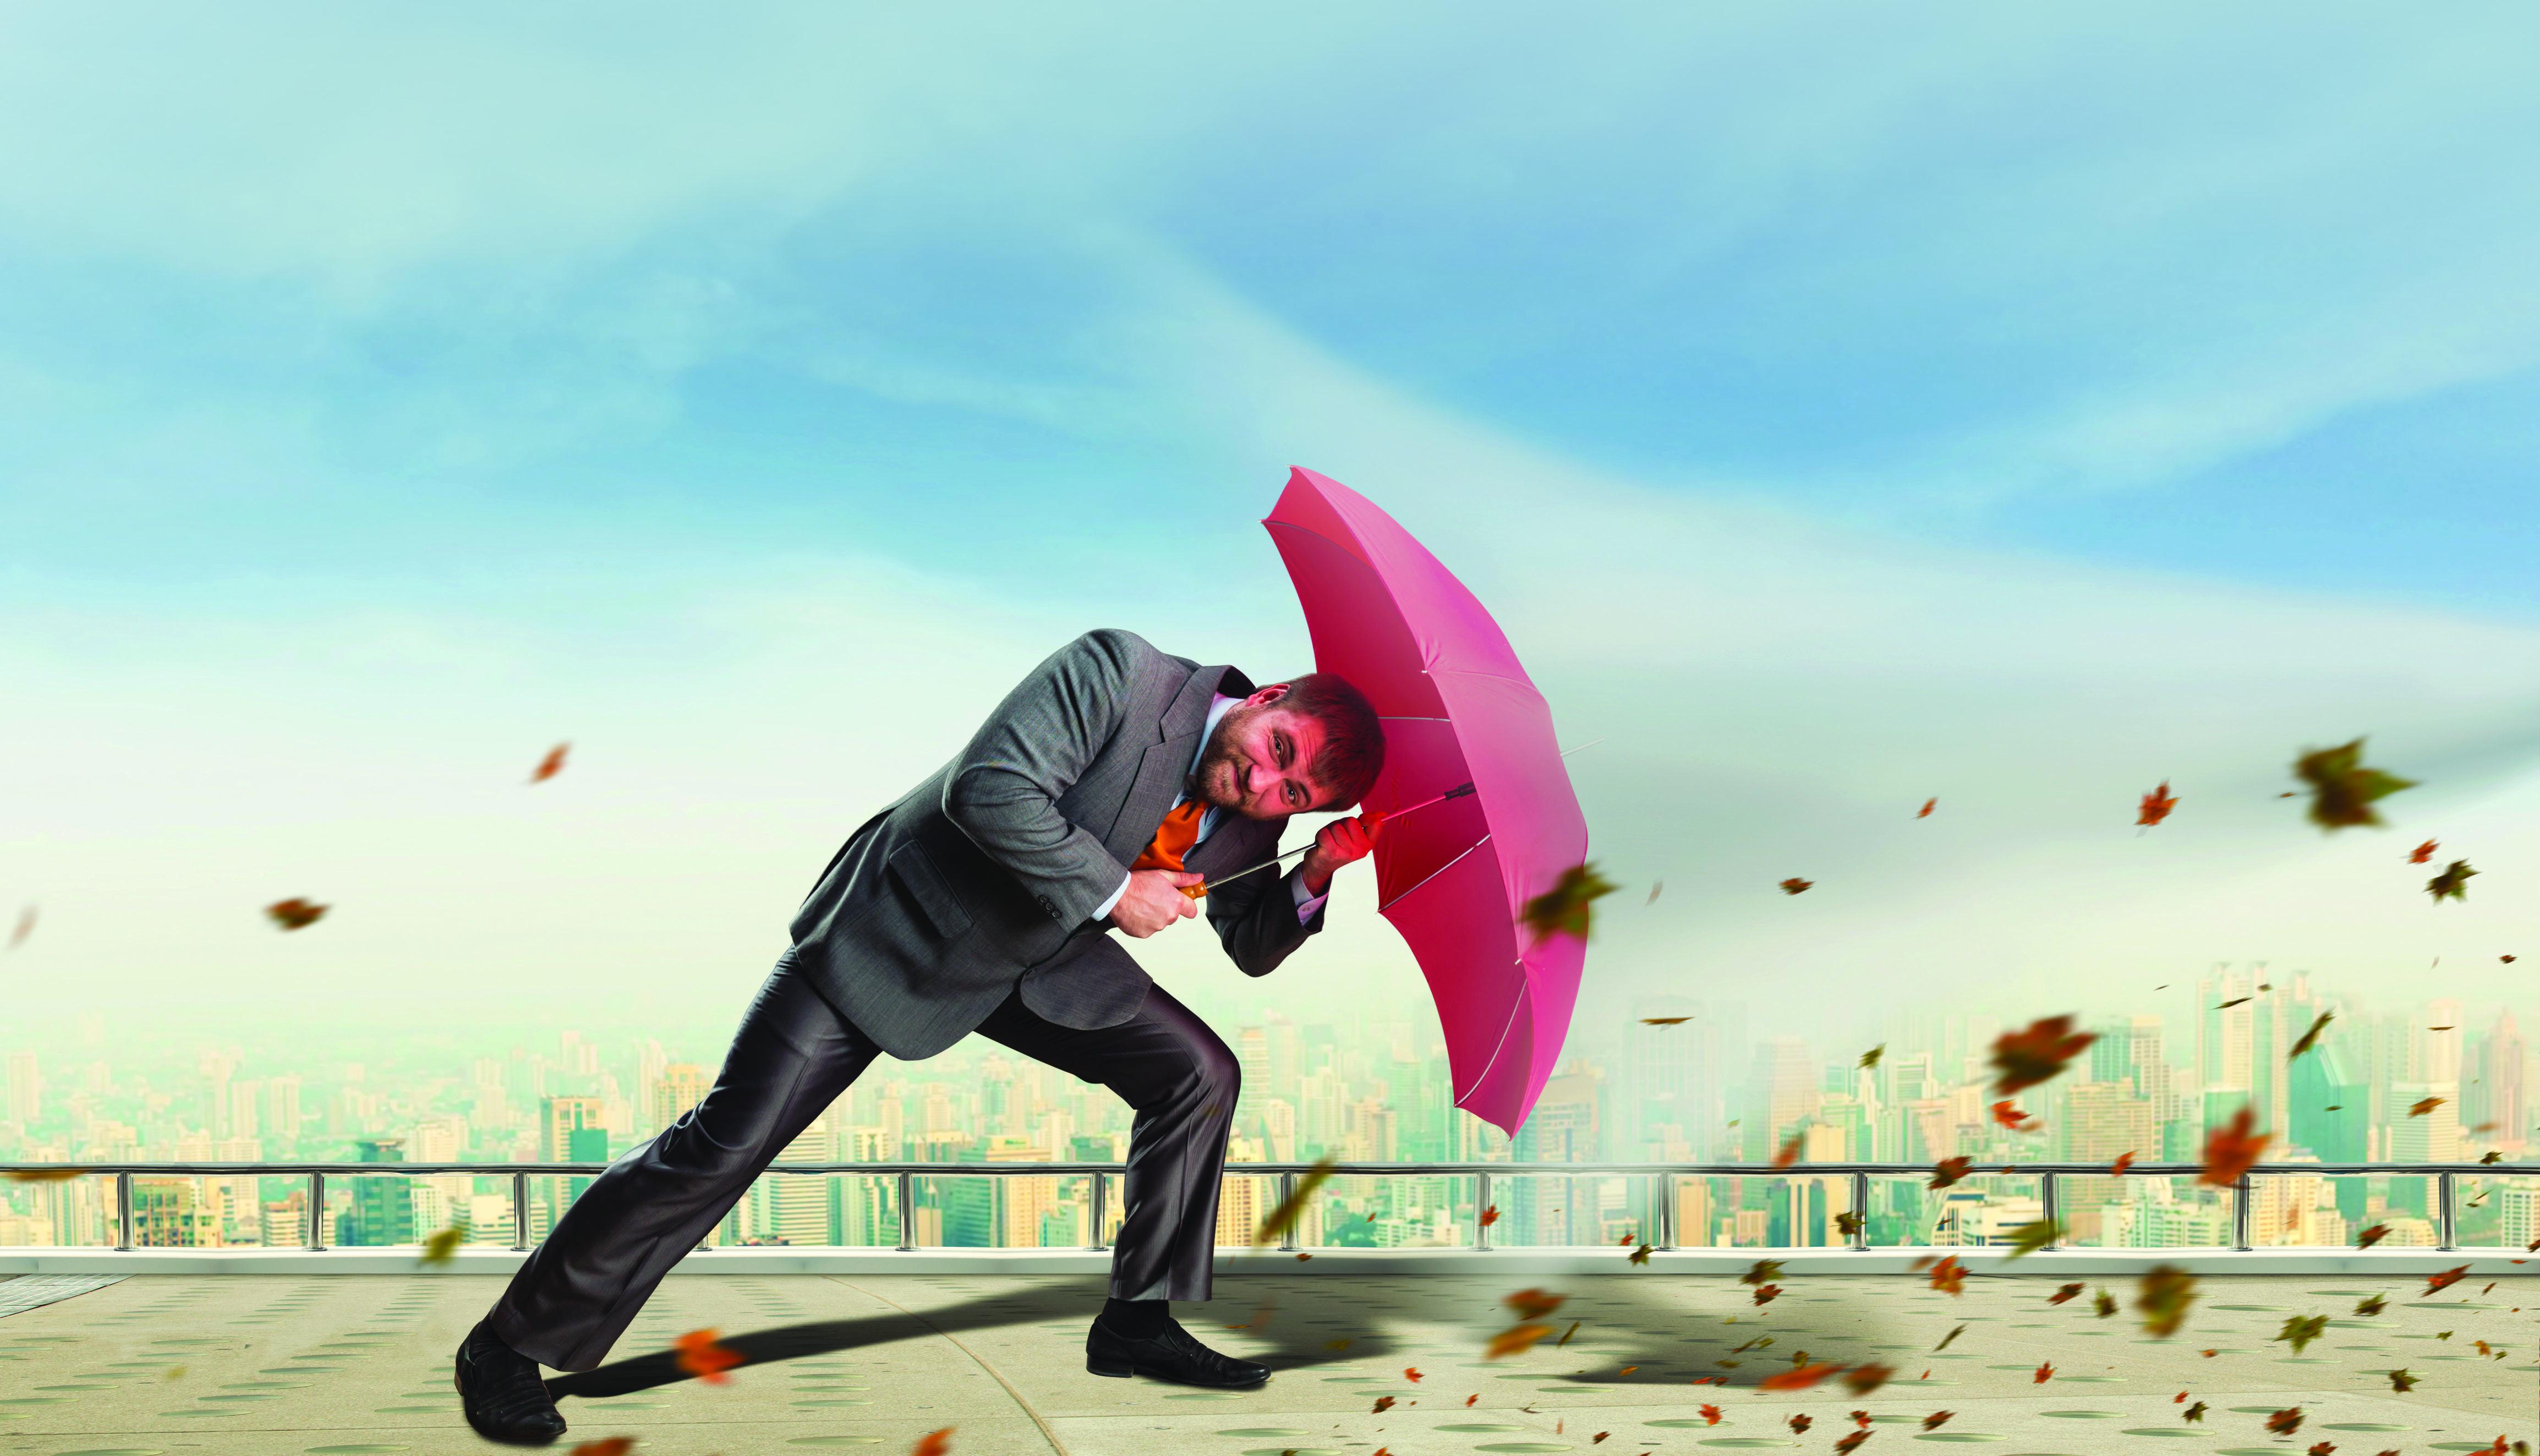 4-Step Business Plan for Surviving a Crisis